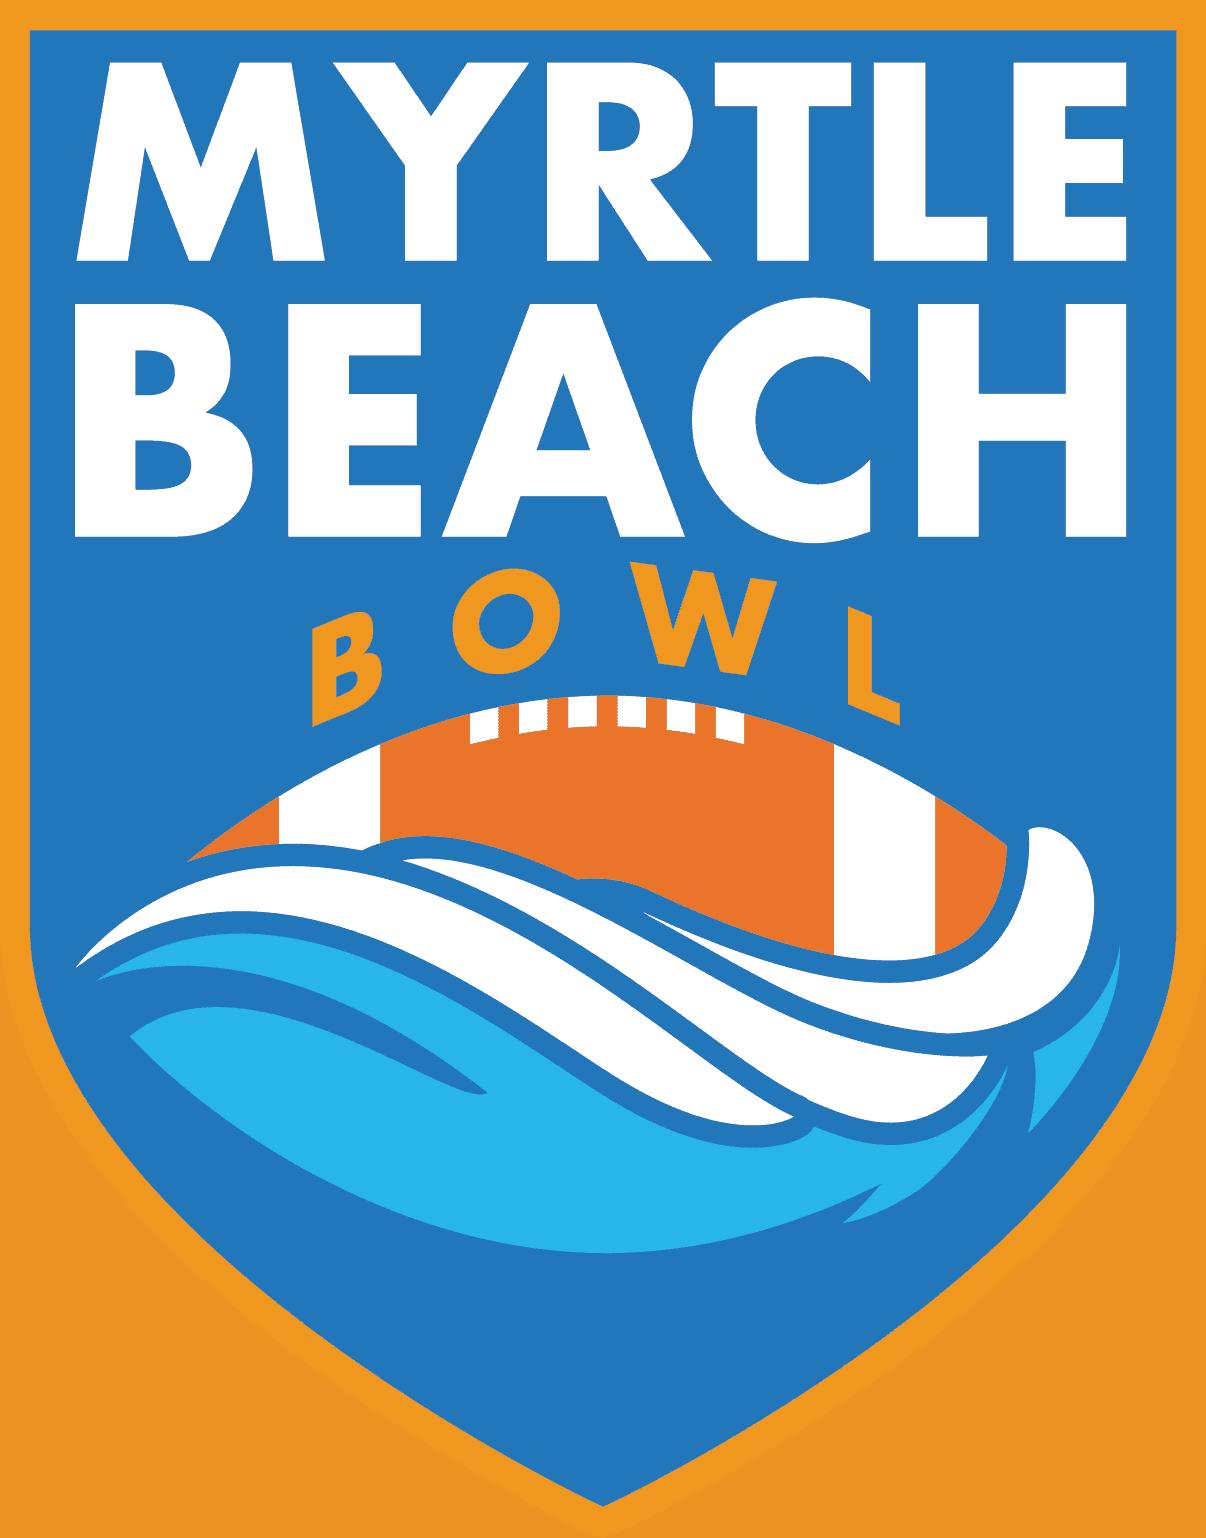 Myrtle Beach Bowl betting